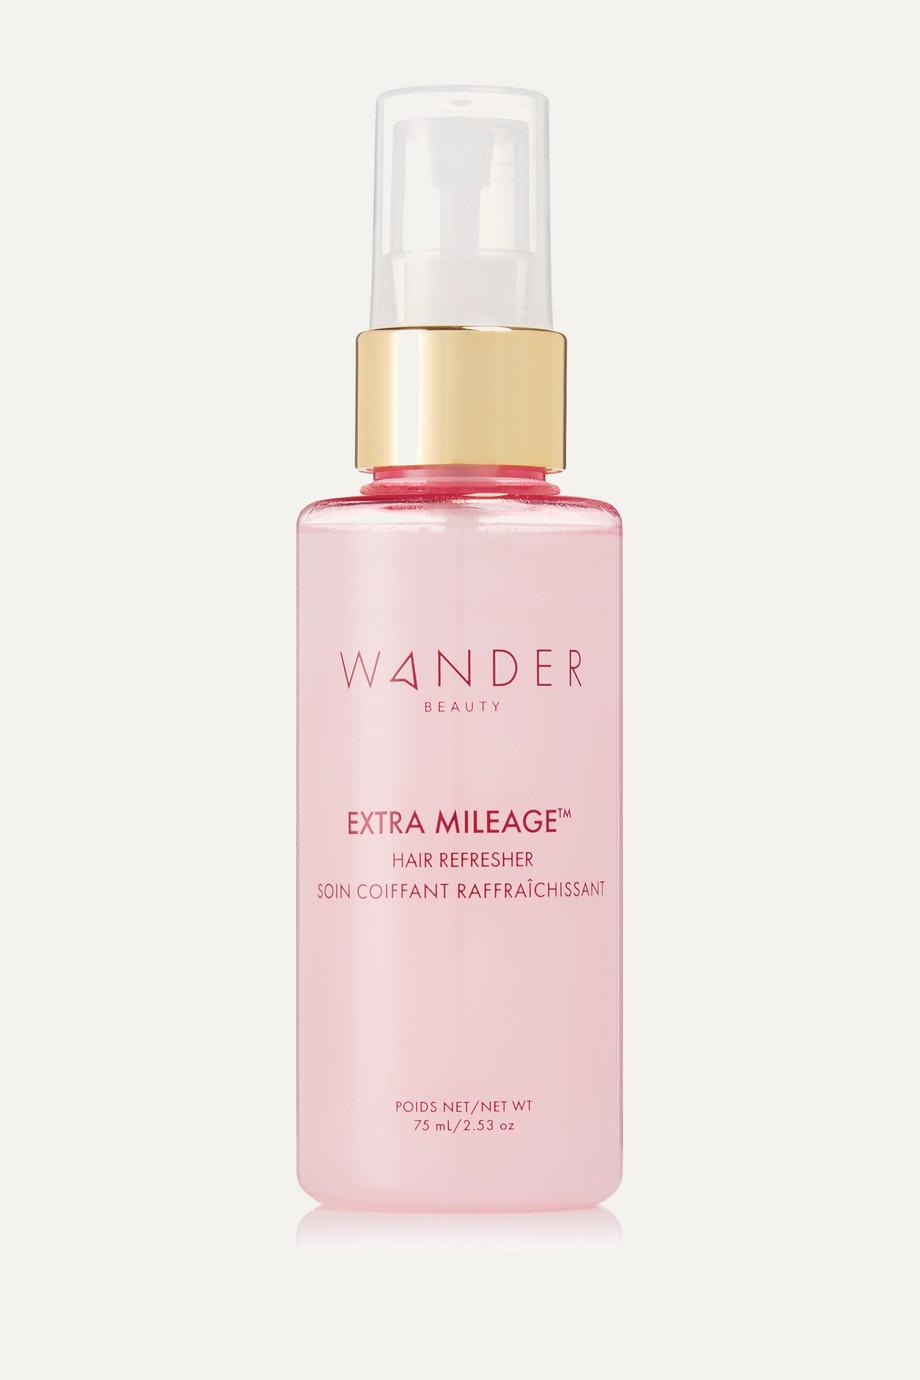 Wander Beauty Extra Mileage Hair Refresher, 75 ml – Trockenshampoo